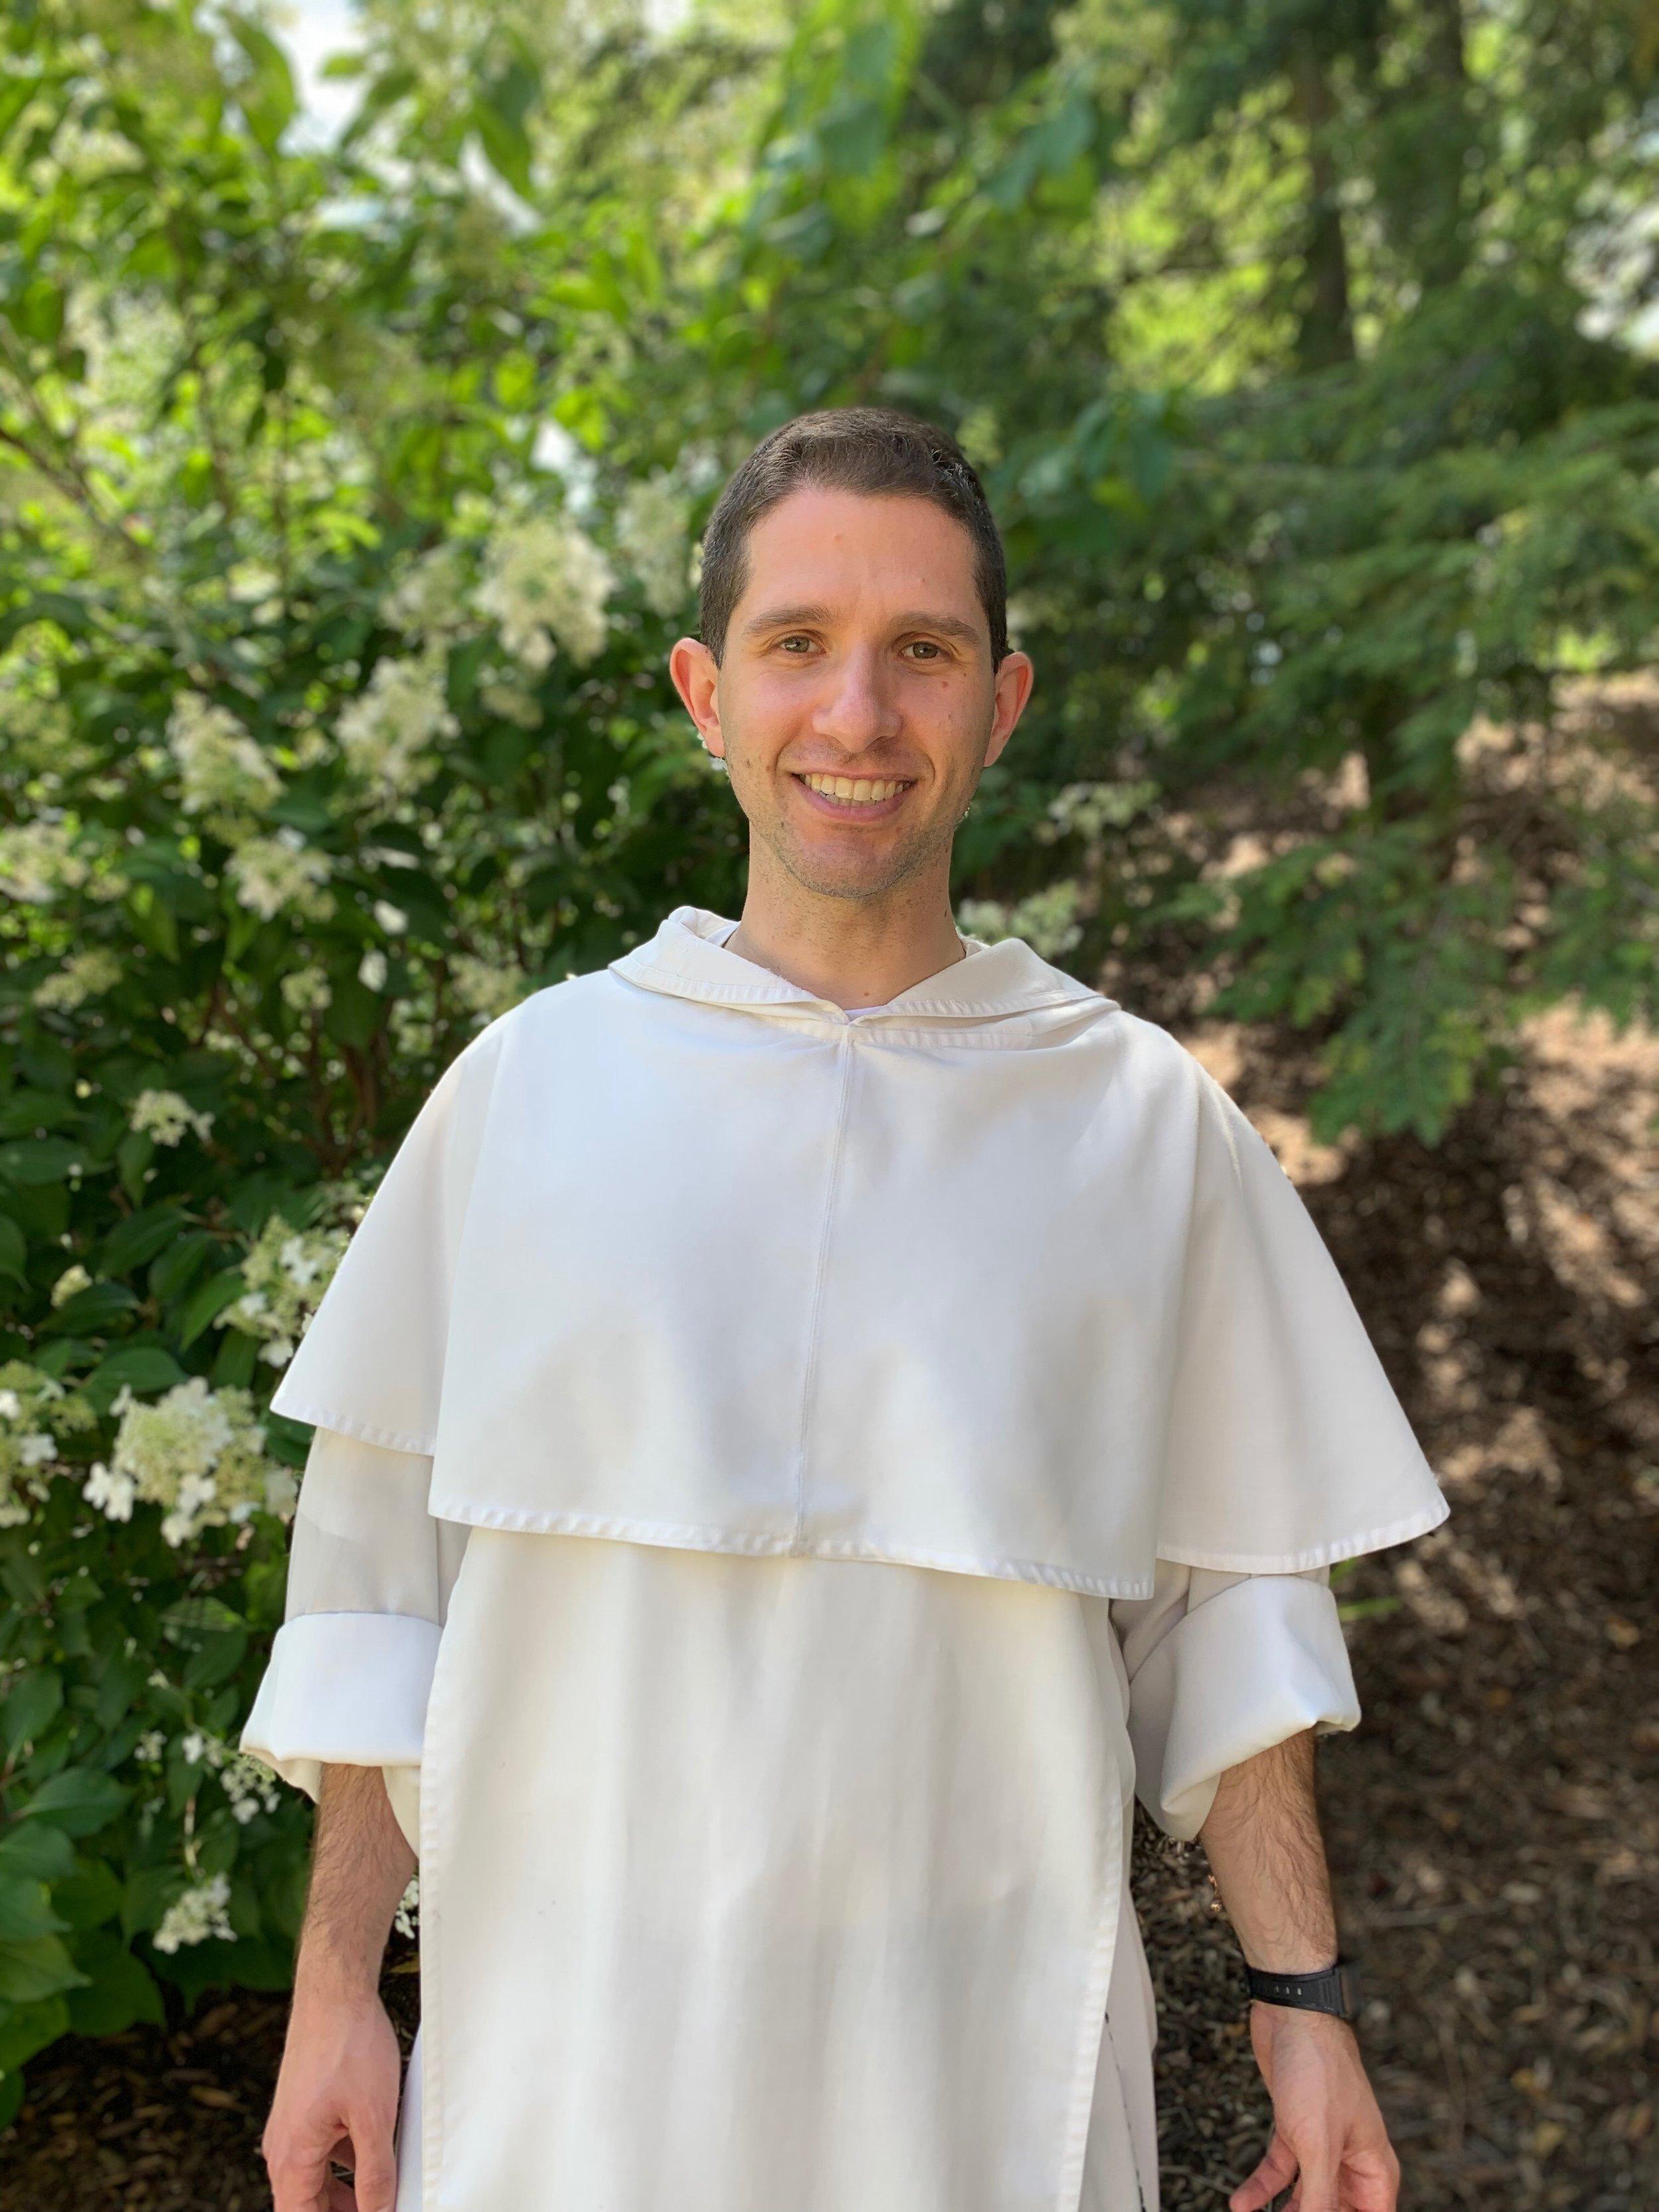 Fr. Nick Monco, Chaplain